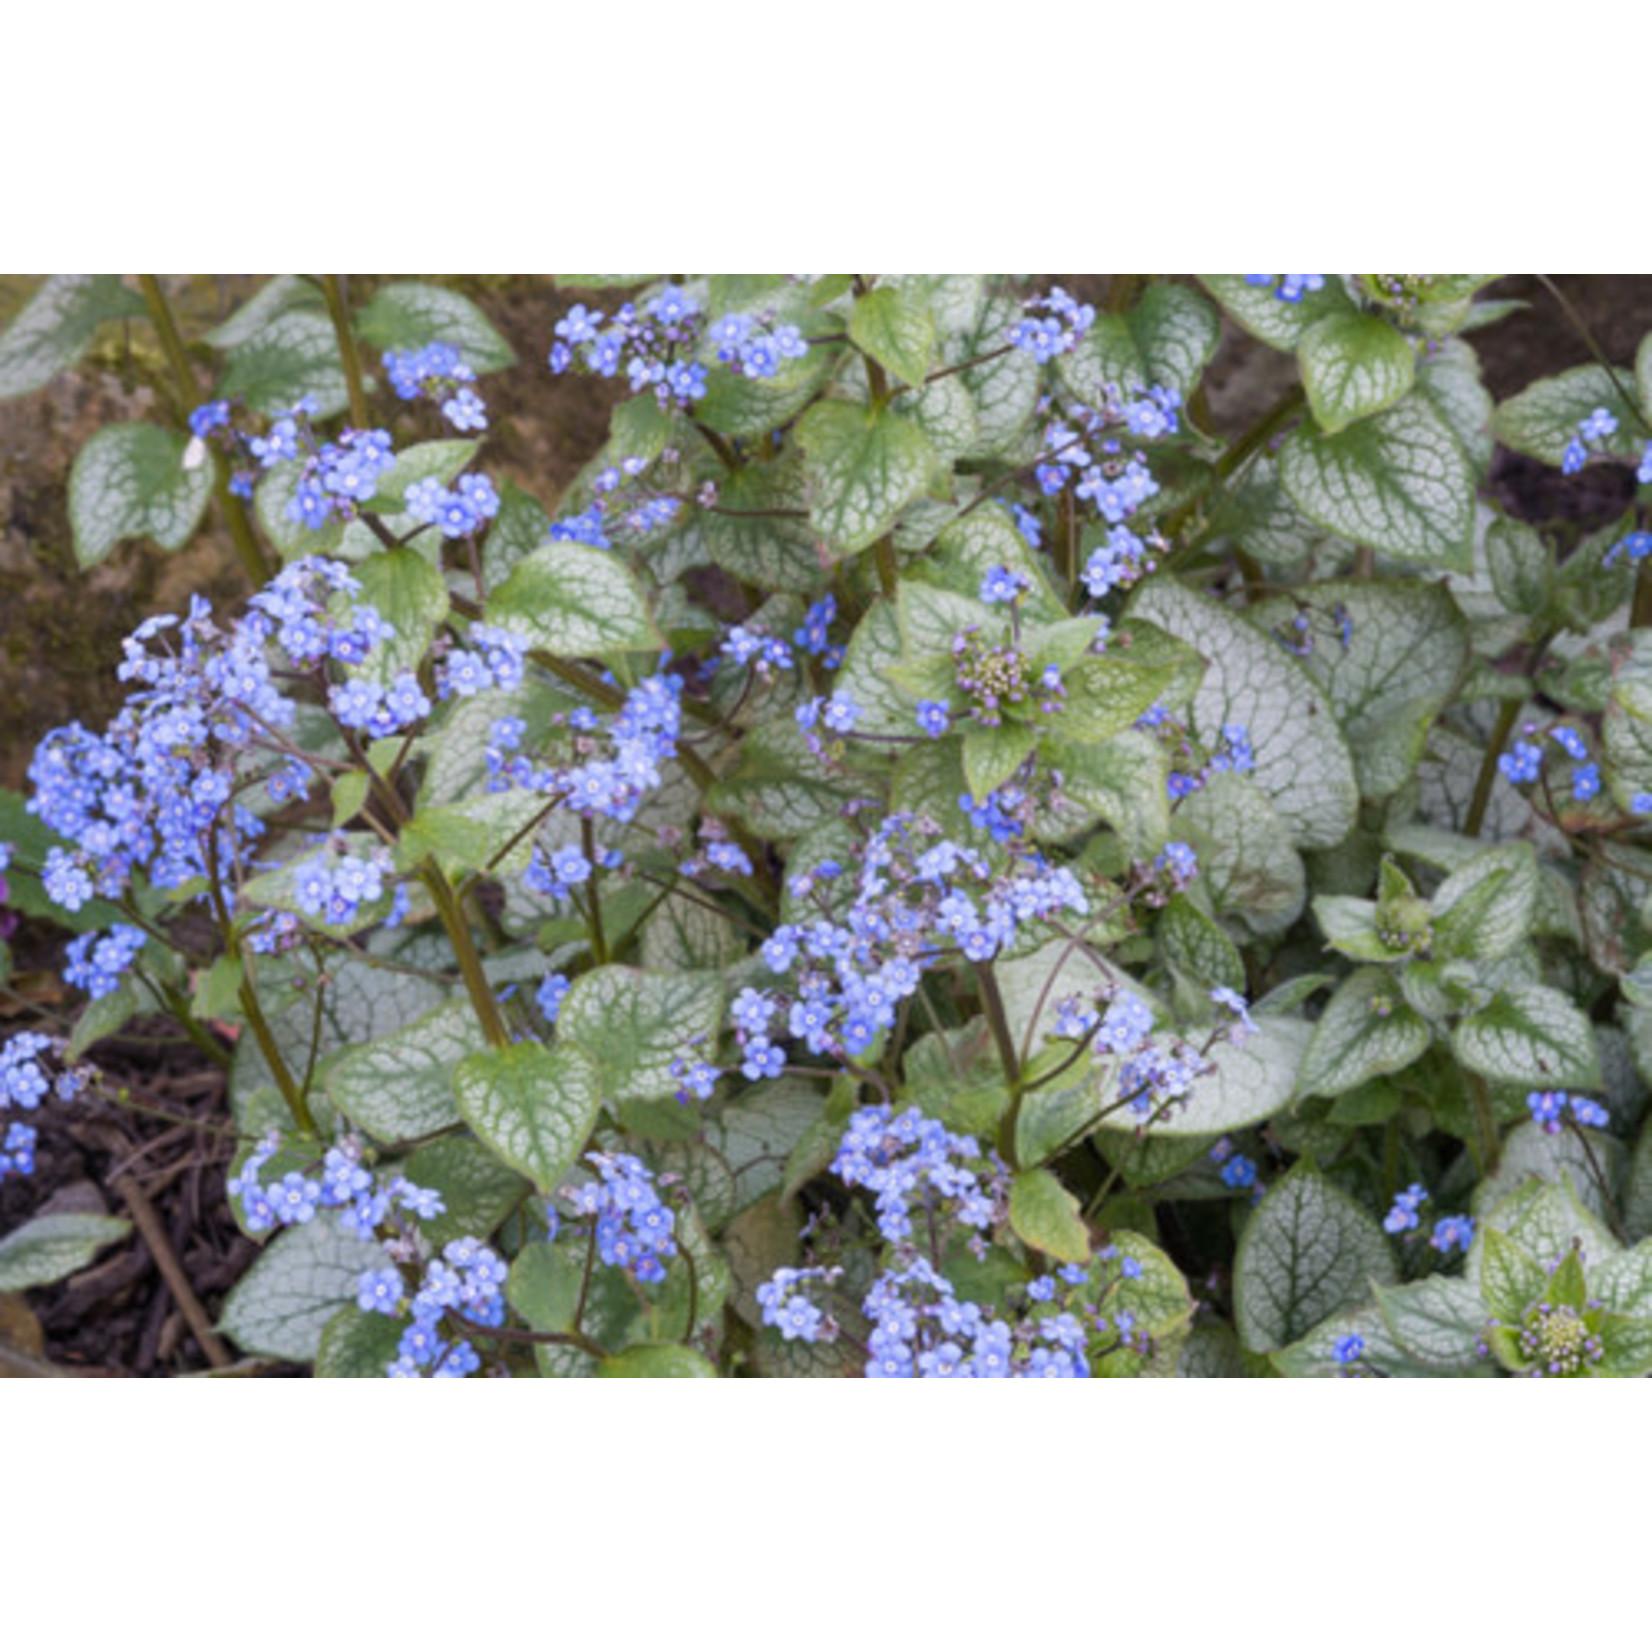 Brunnera 'jack frost' - 1 gal